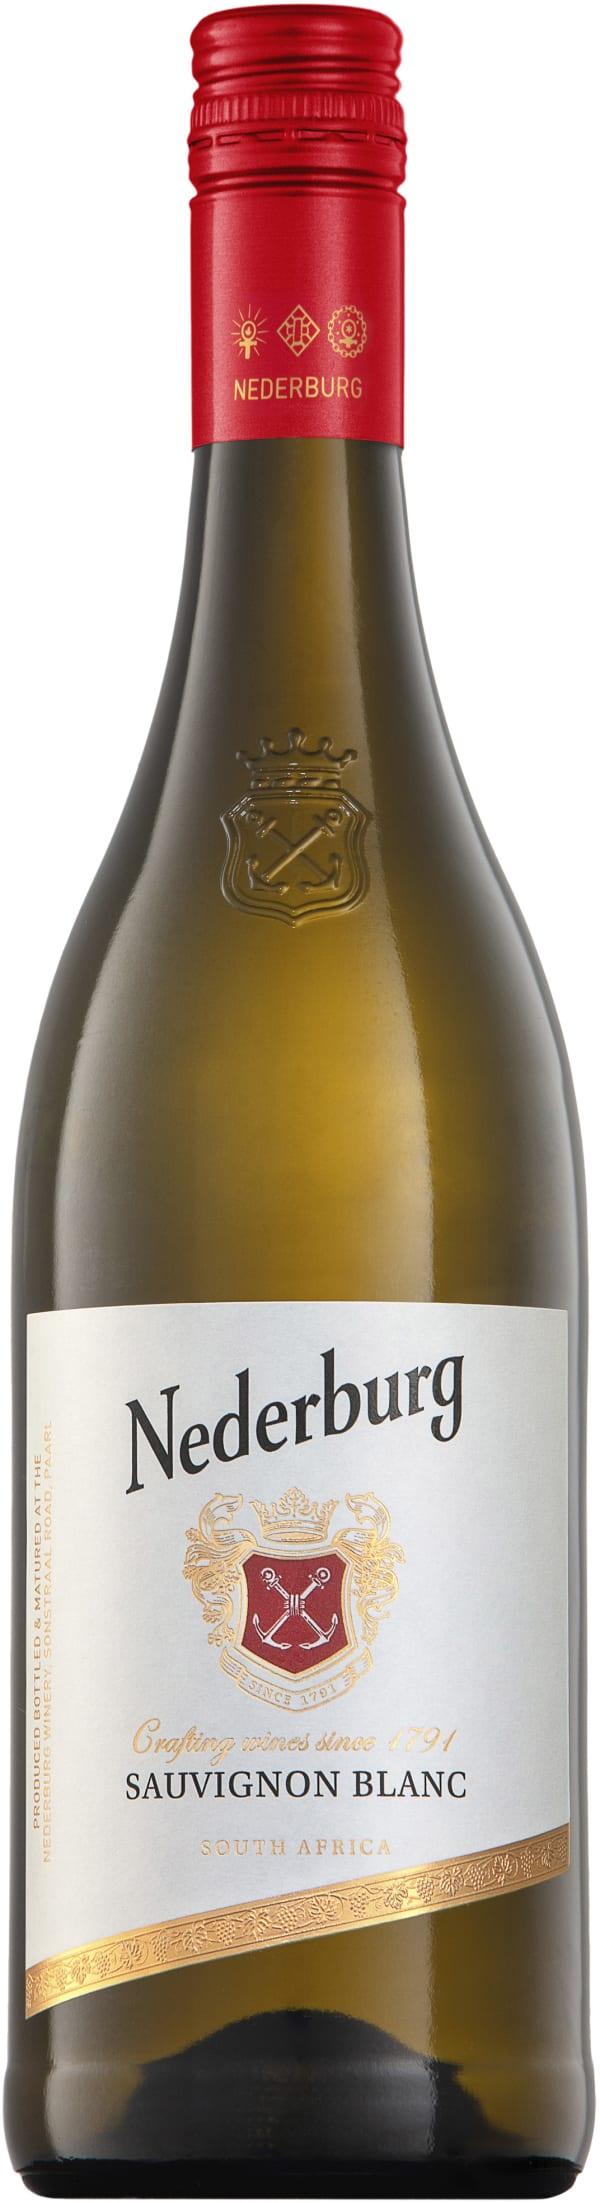 Nederburg The Winemasters Sauvignon Blanc 2016